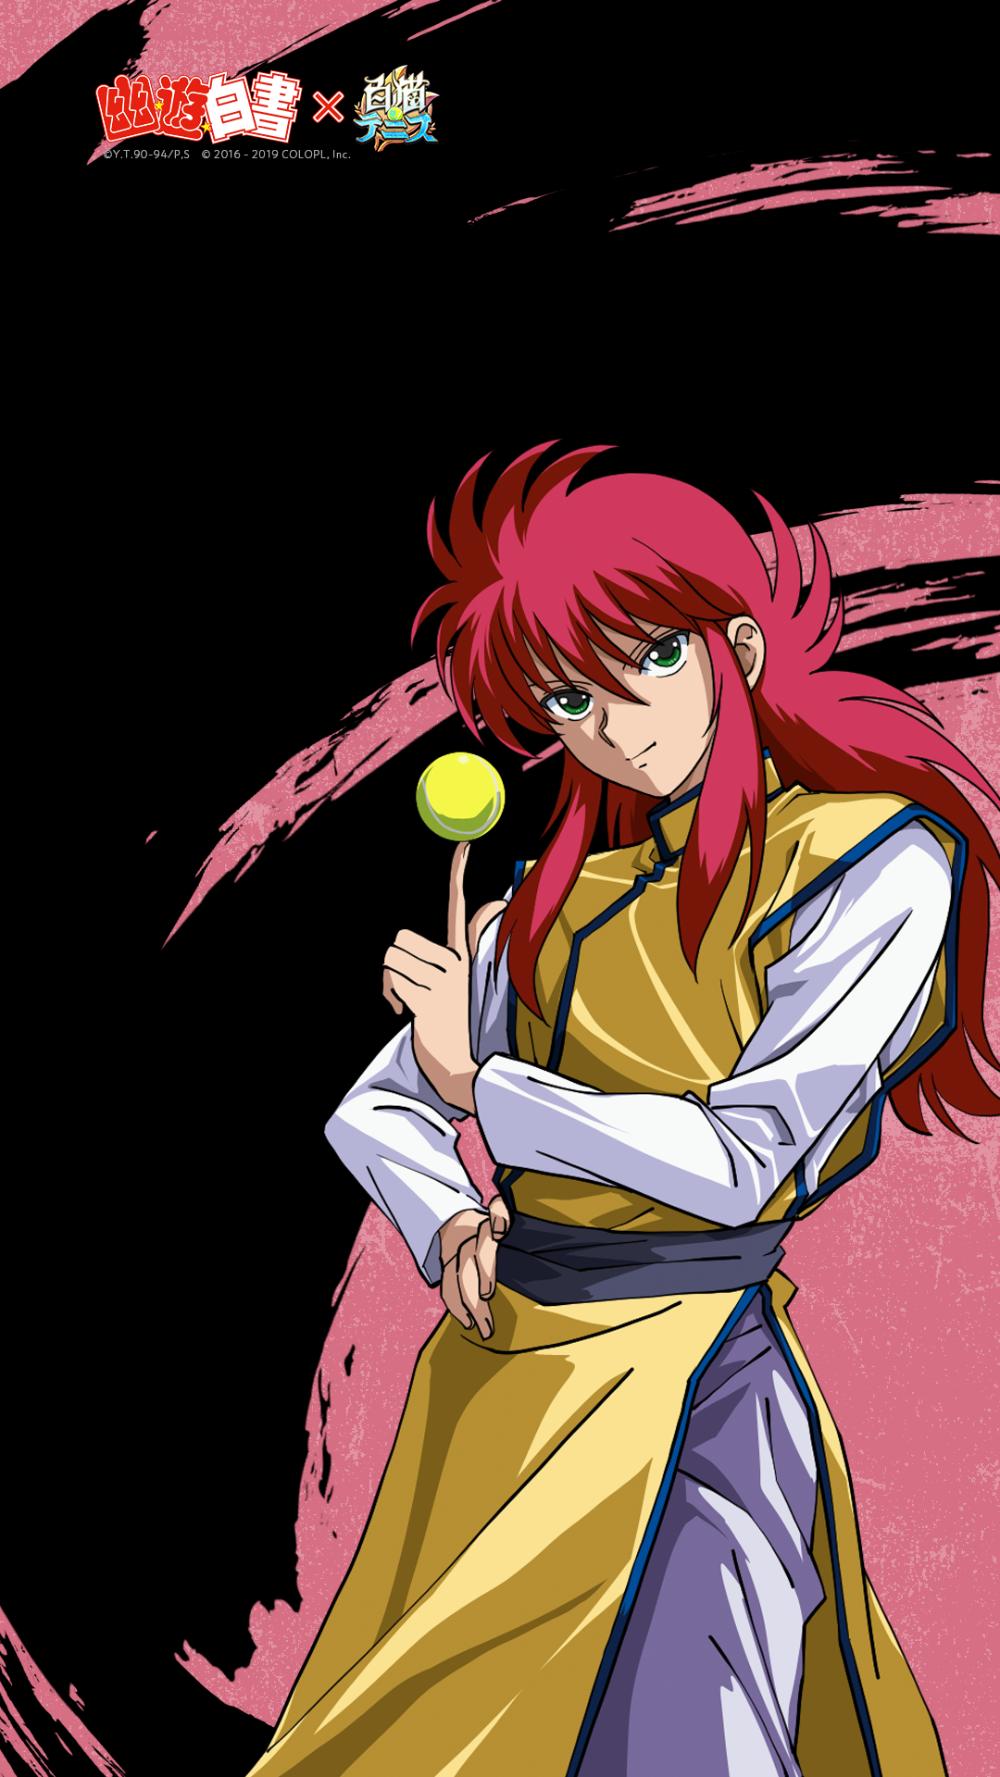 Kurama  - Yu Yu Hakusho - Mobile Wallpaper #2594634 - Zerochan Anime Image Board